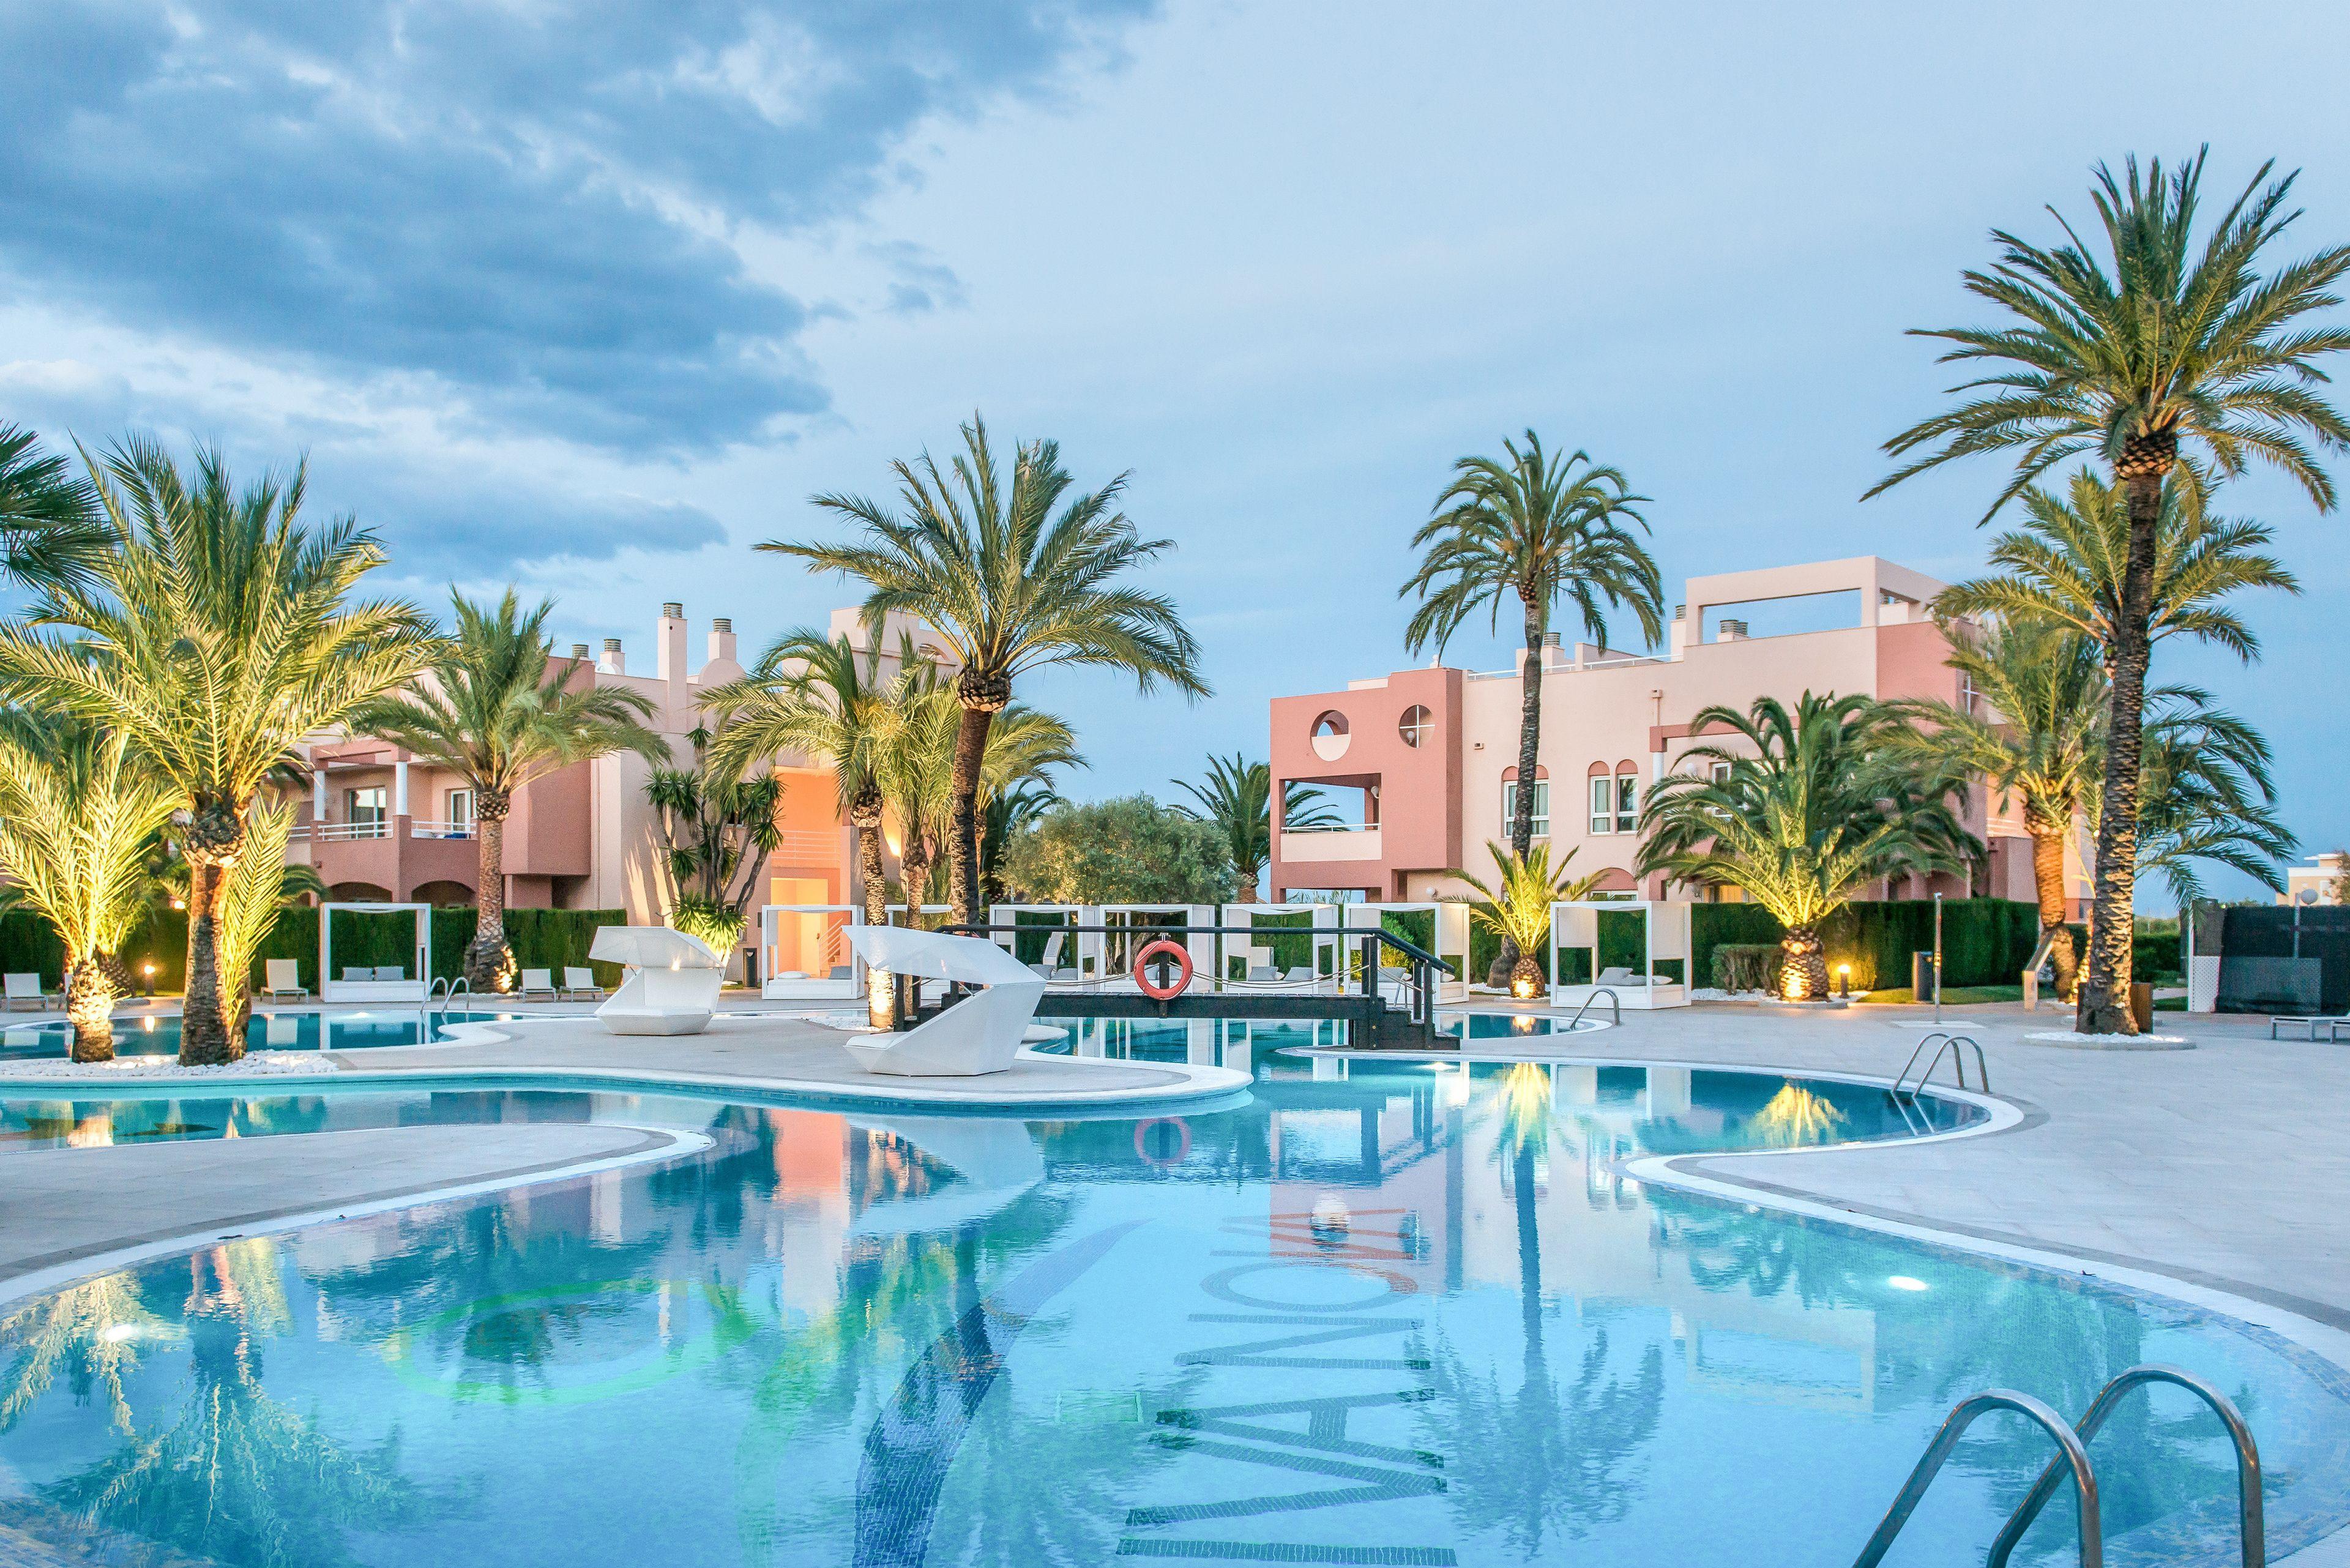 Courtesy of Oliva Nova Golf Beach & Golf Hotel / Expedia